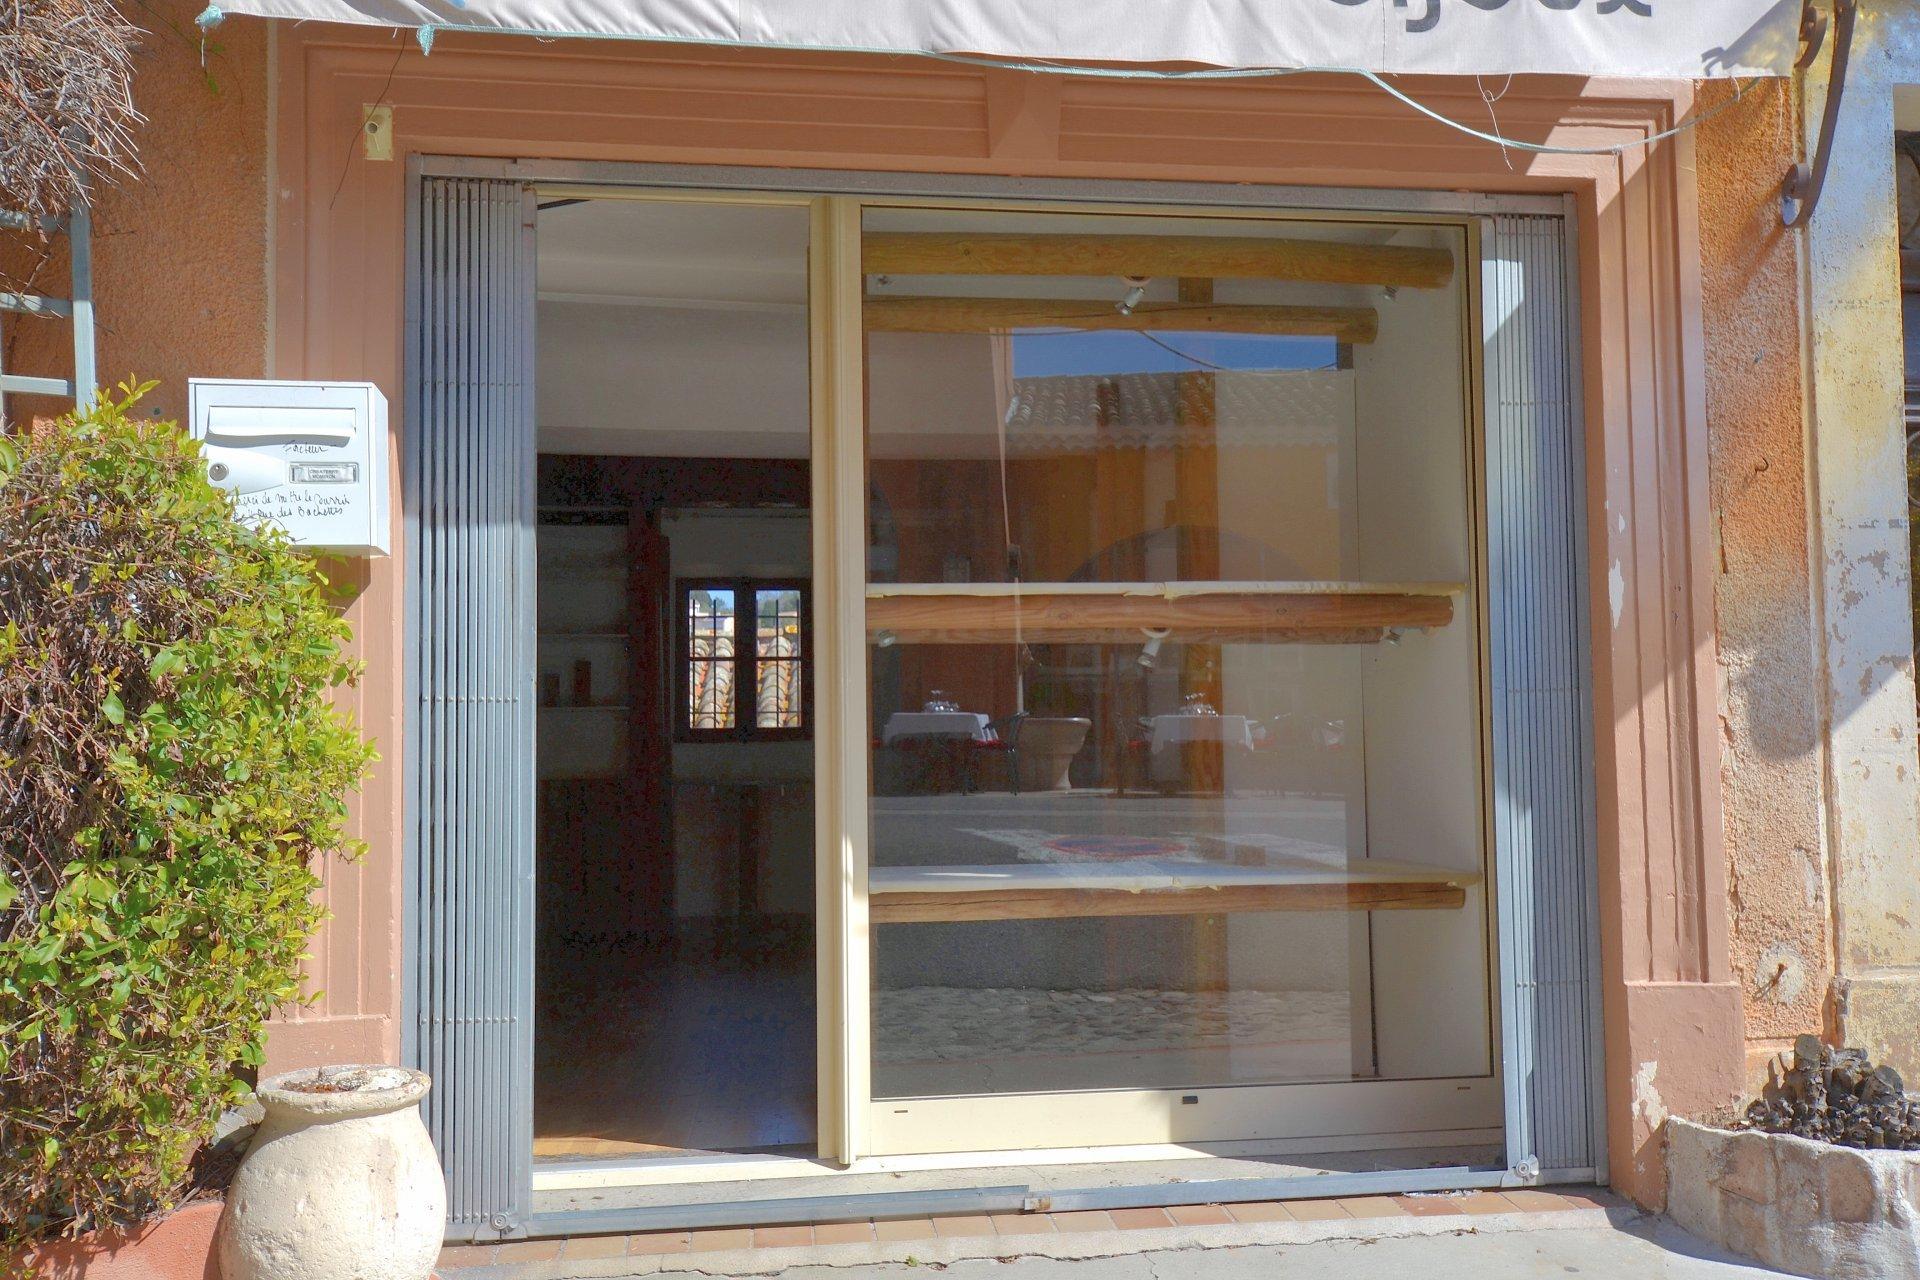 Rental Business - Biot Village